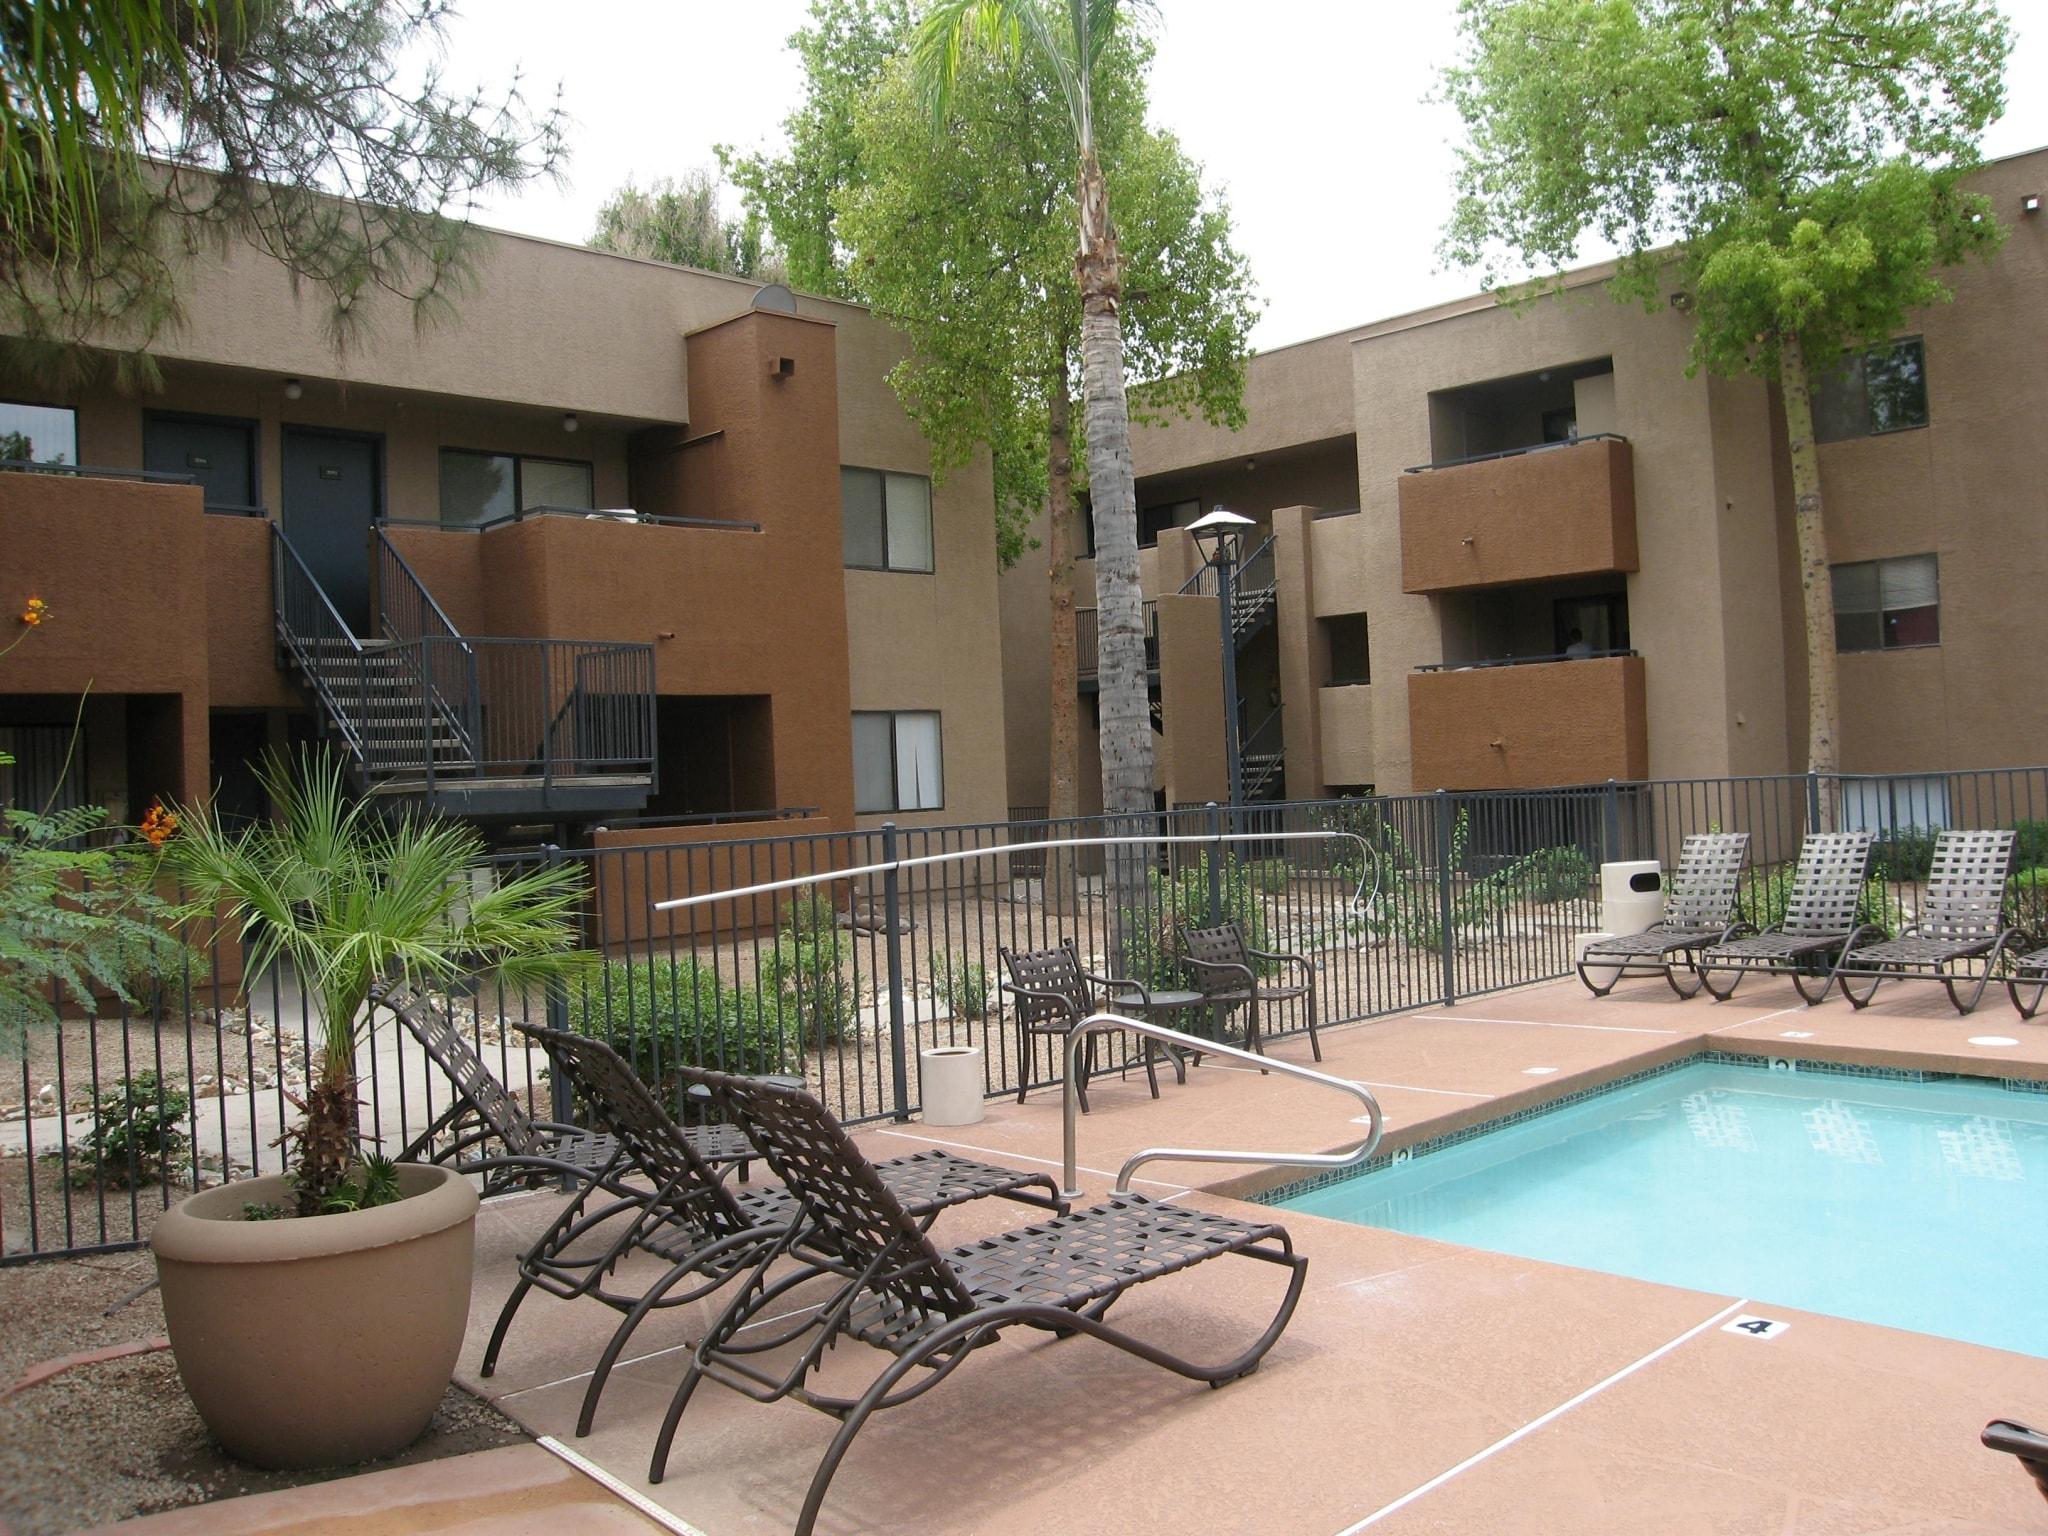 Summerhill Place Apartments photo